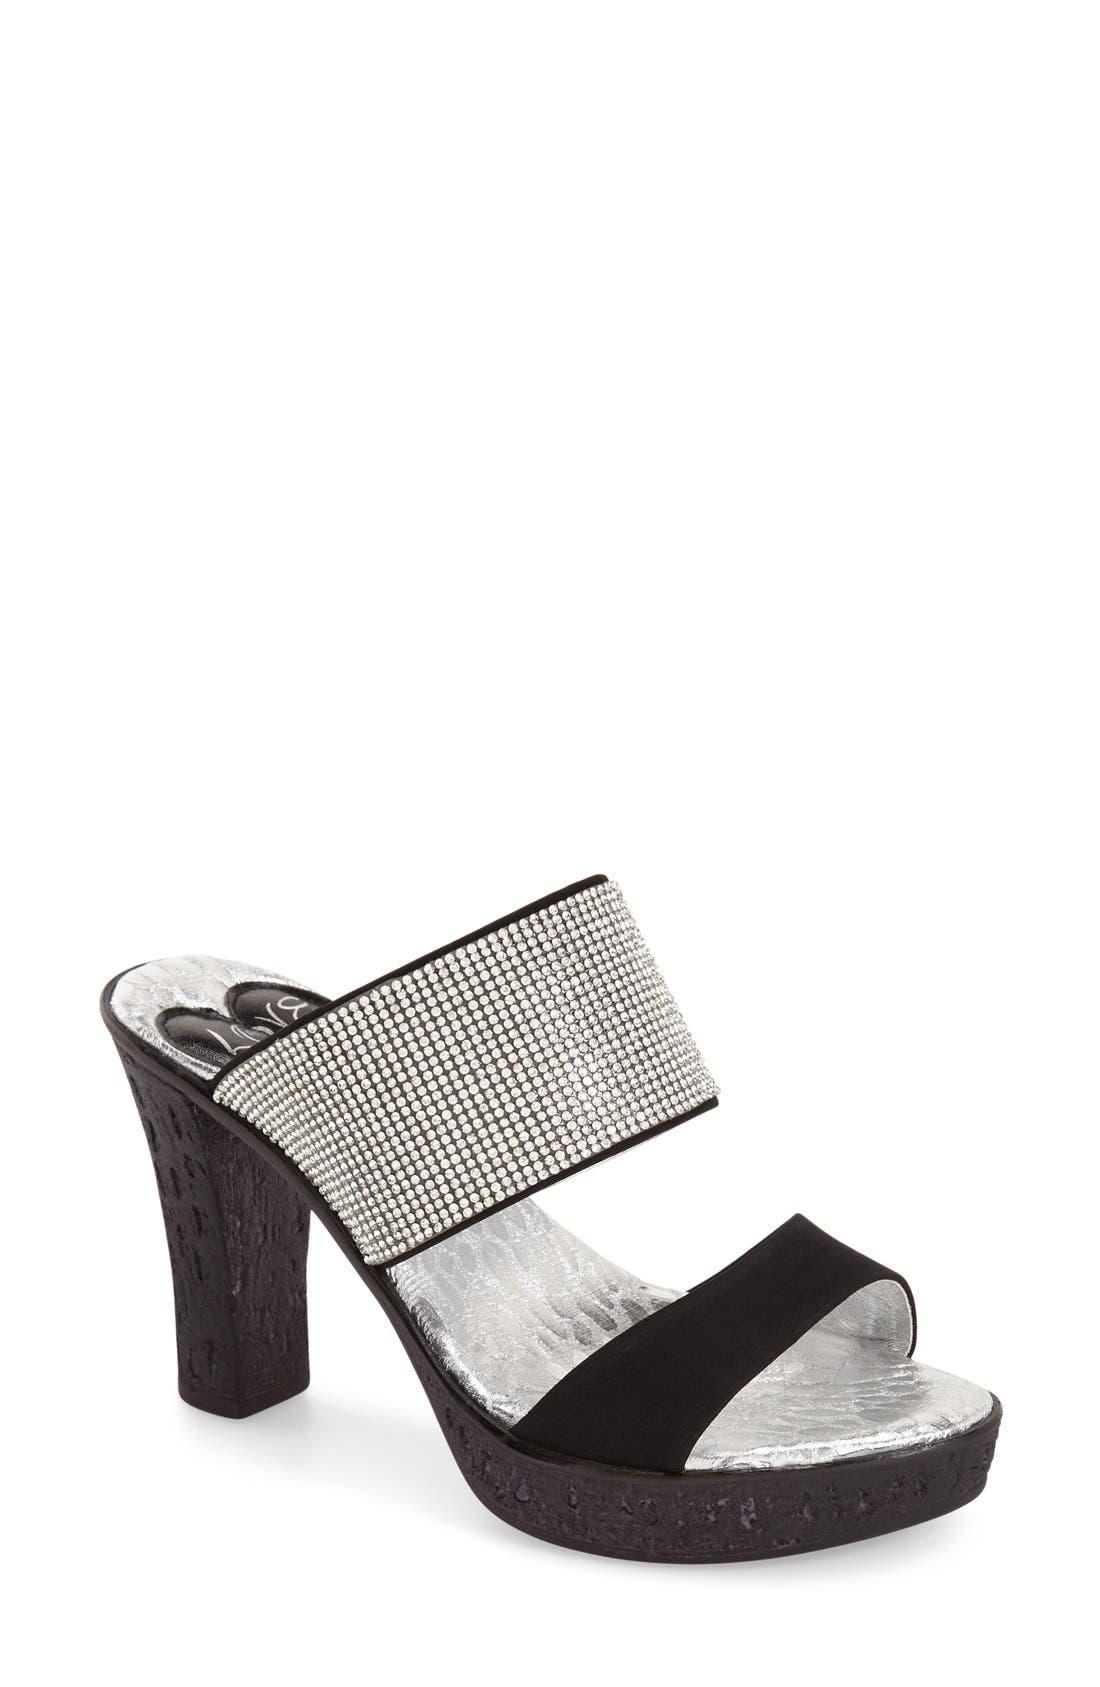 Main Image - Love and Liberty 'Dakota' Crystal Embellished Double Band Sandal (Women)